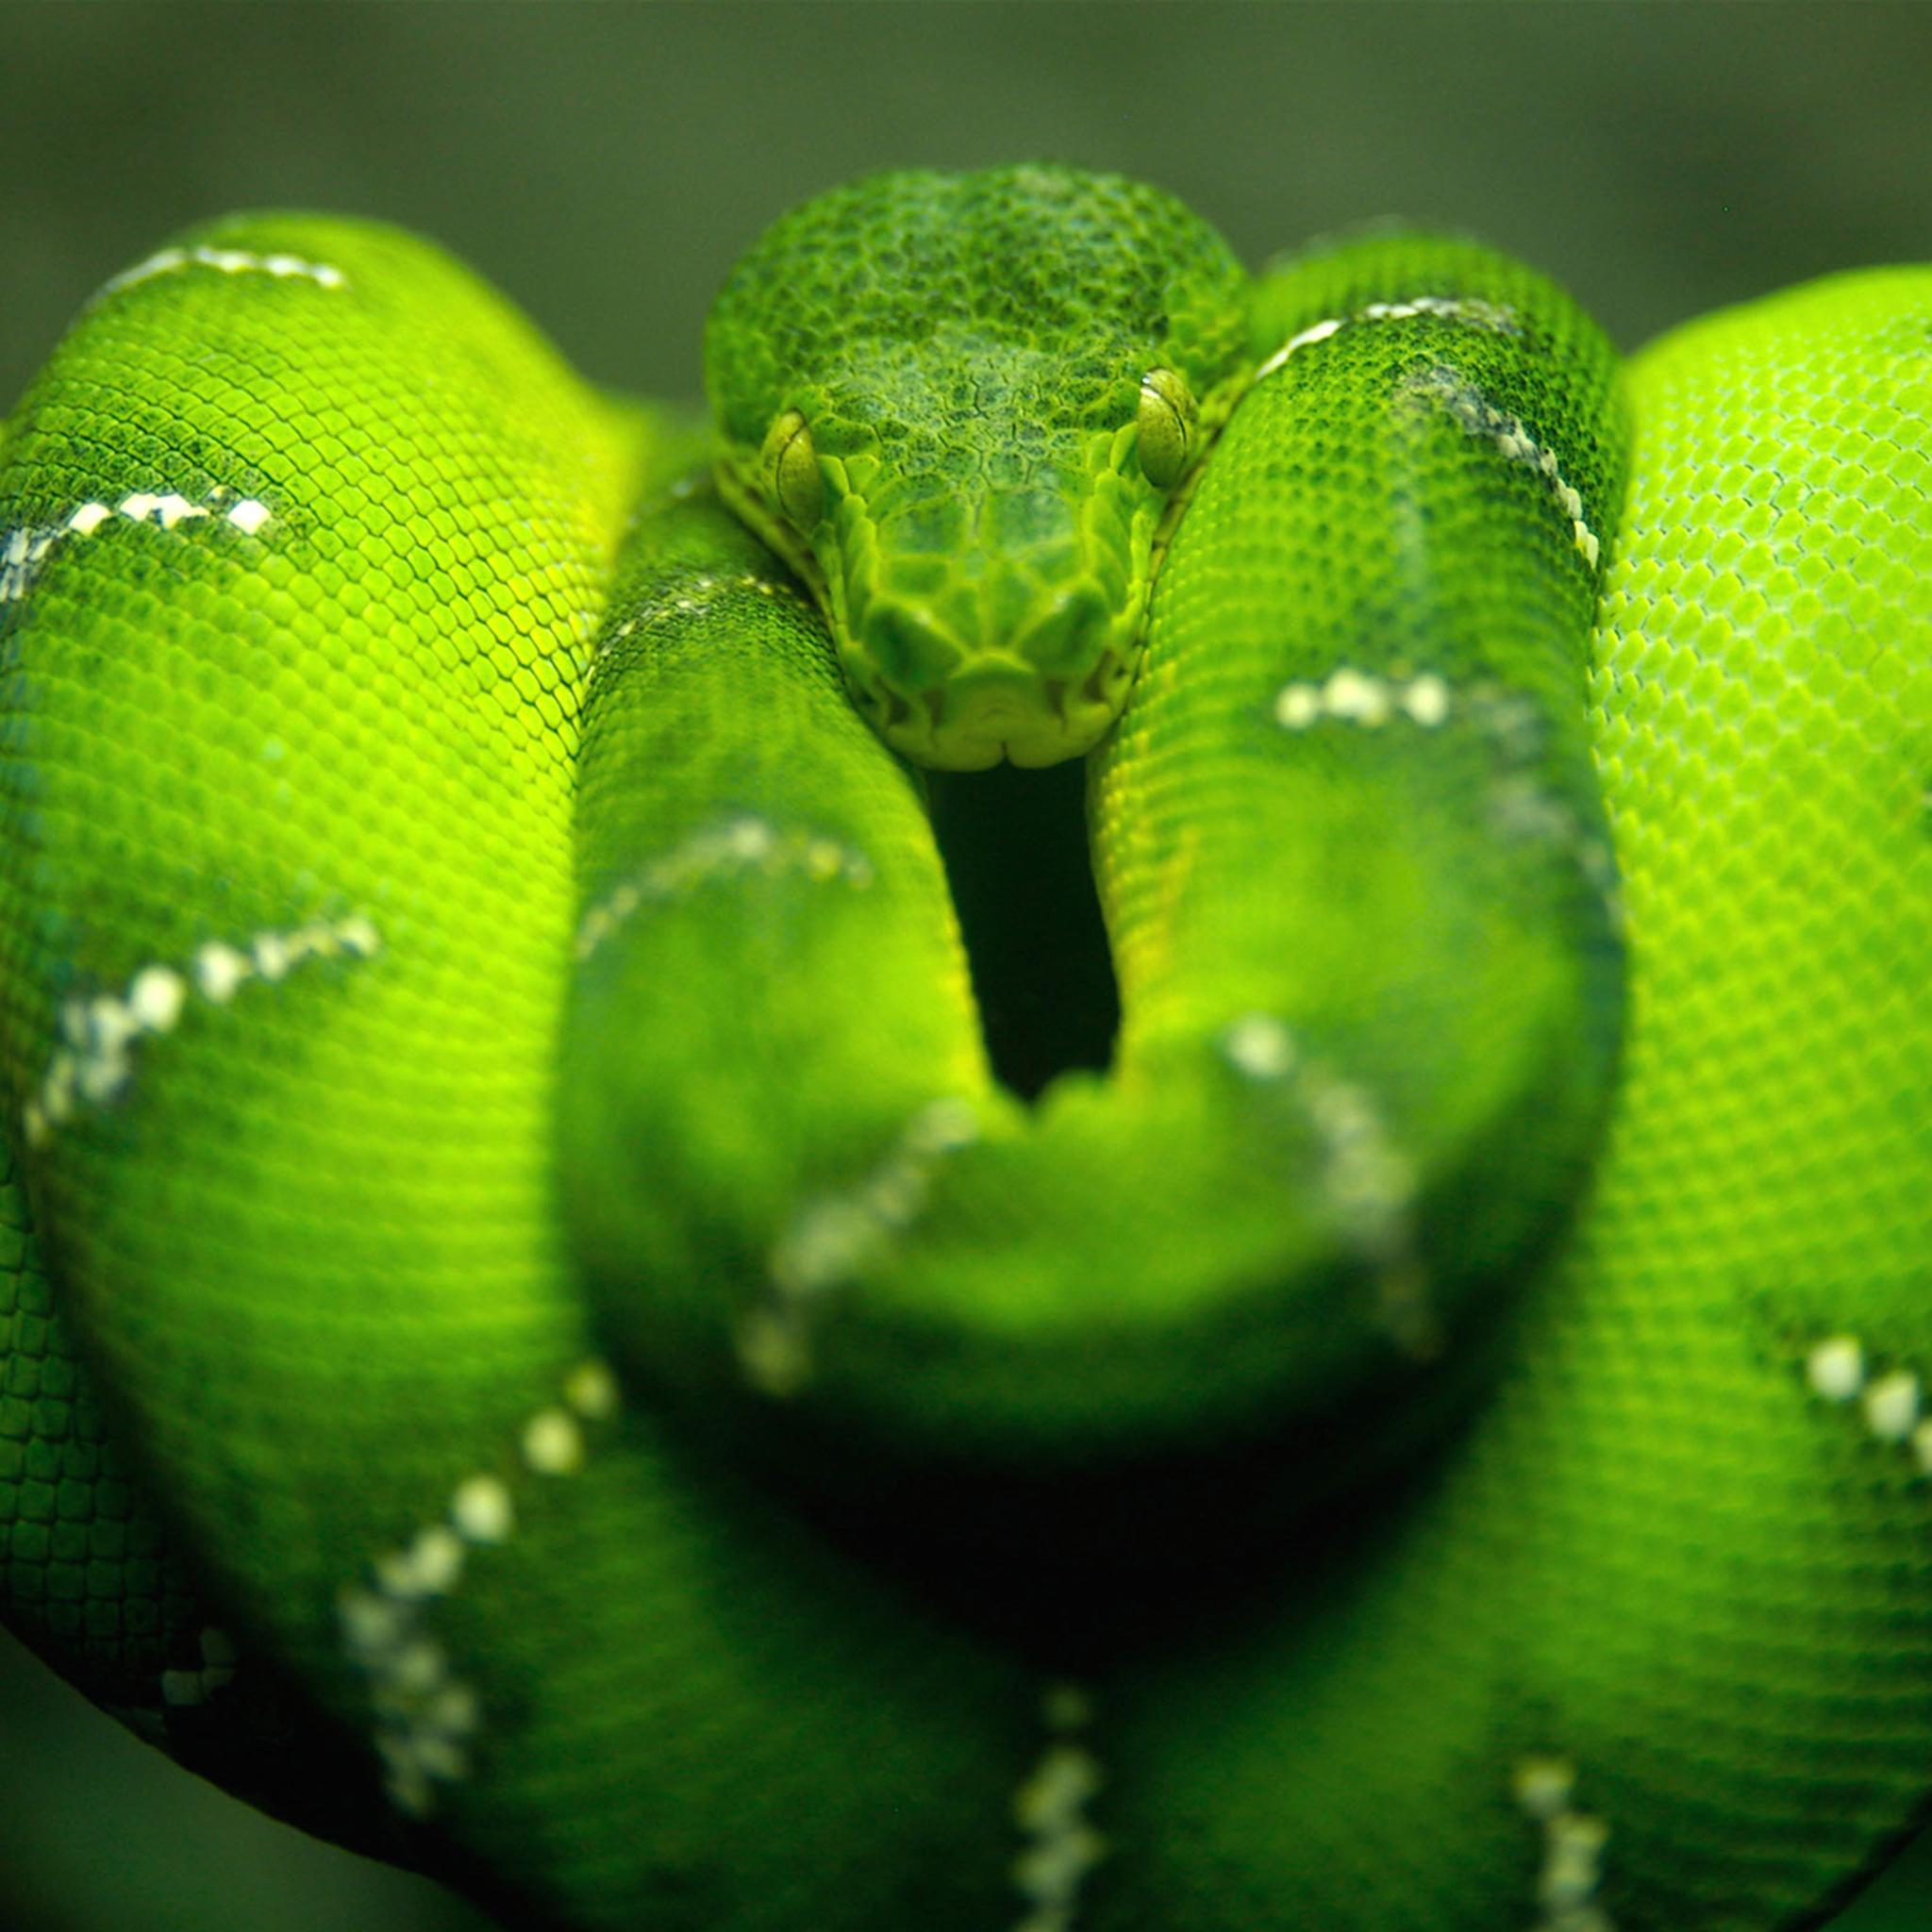 Green-Snake-3Wallpapers-iPad-Retina